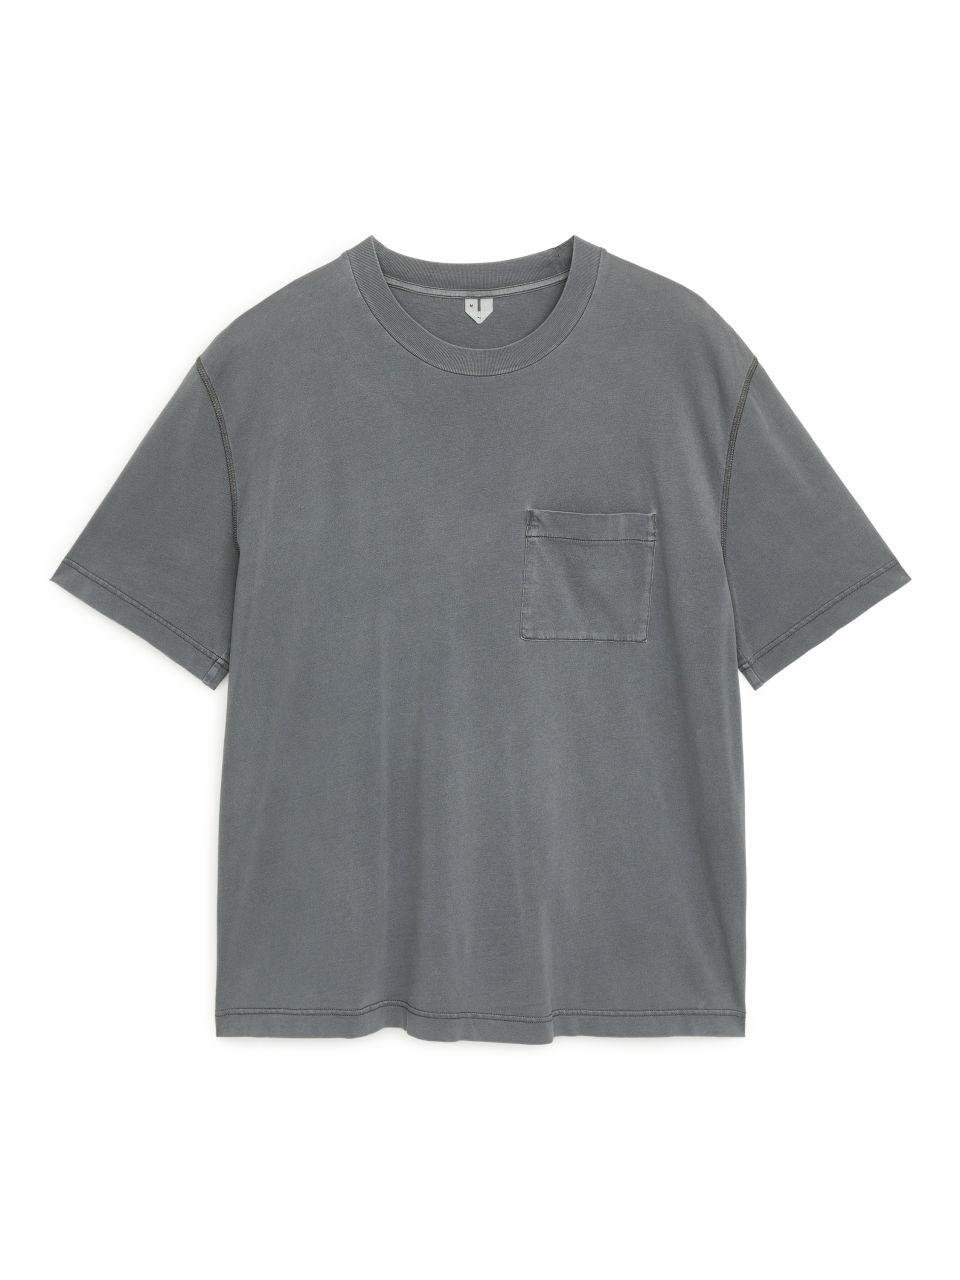 Garment-Dyed T-shirt - Grey